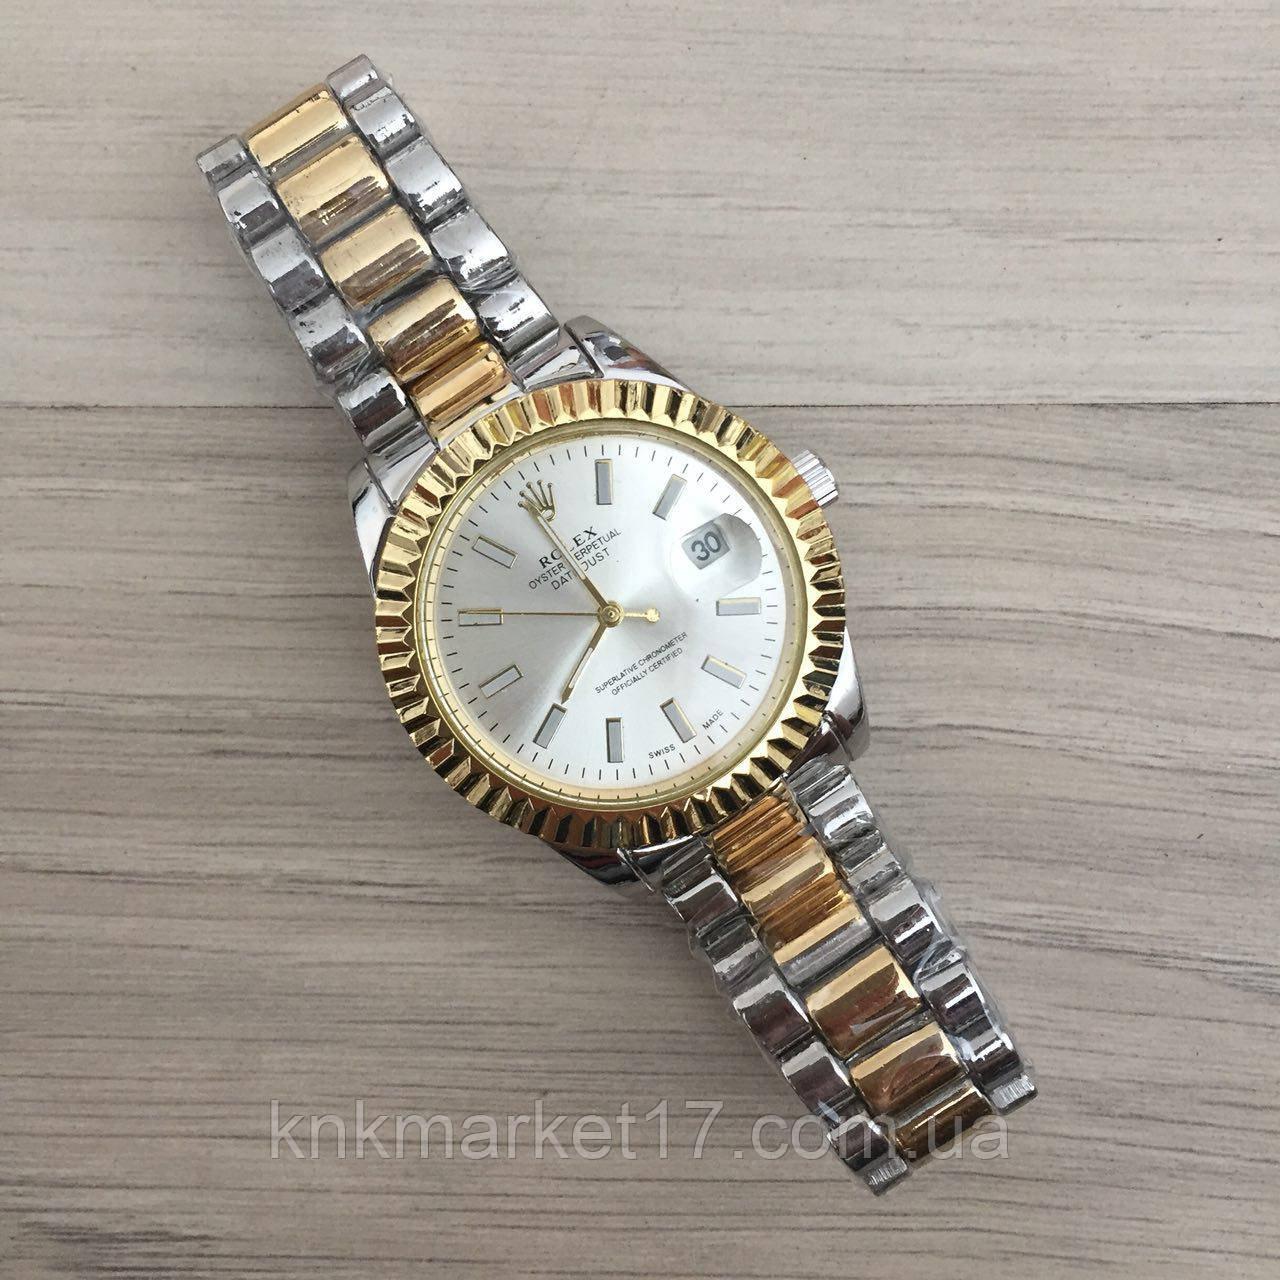 Rolex Date Just Silver-Gold-Silver